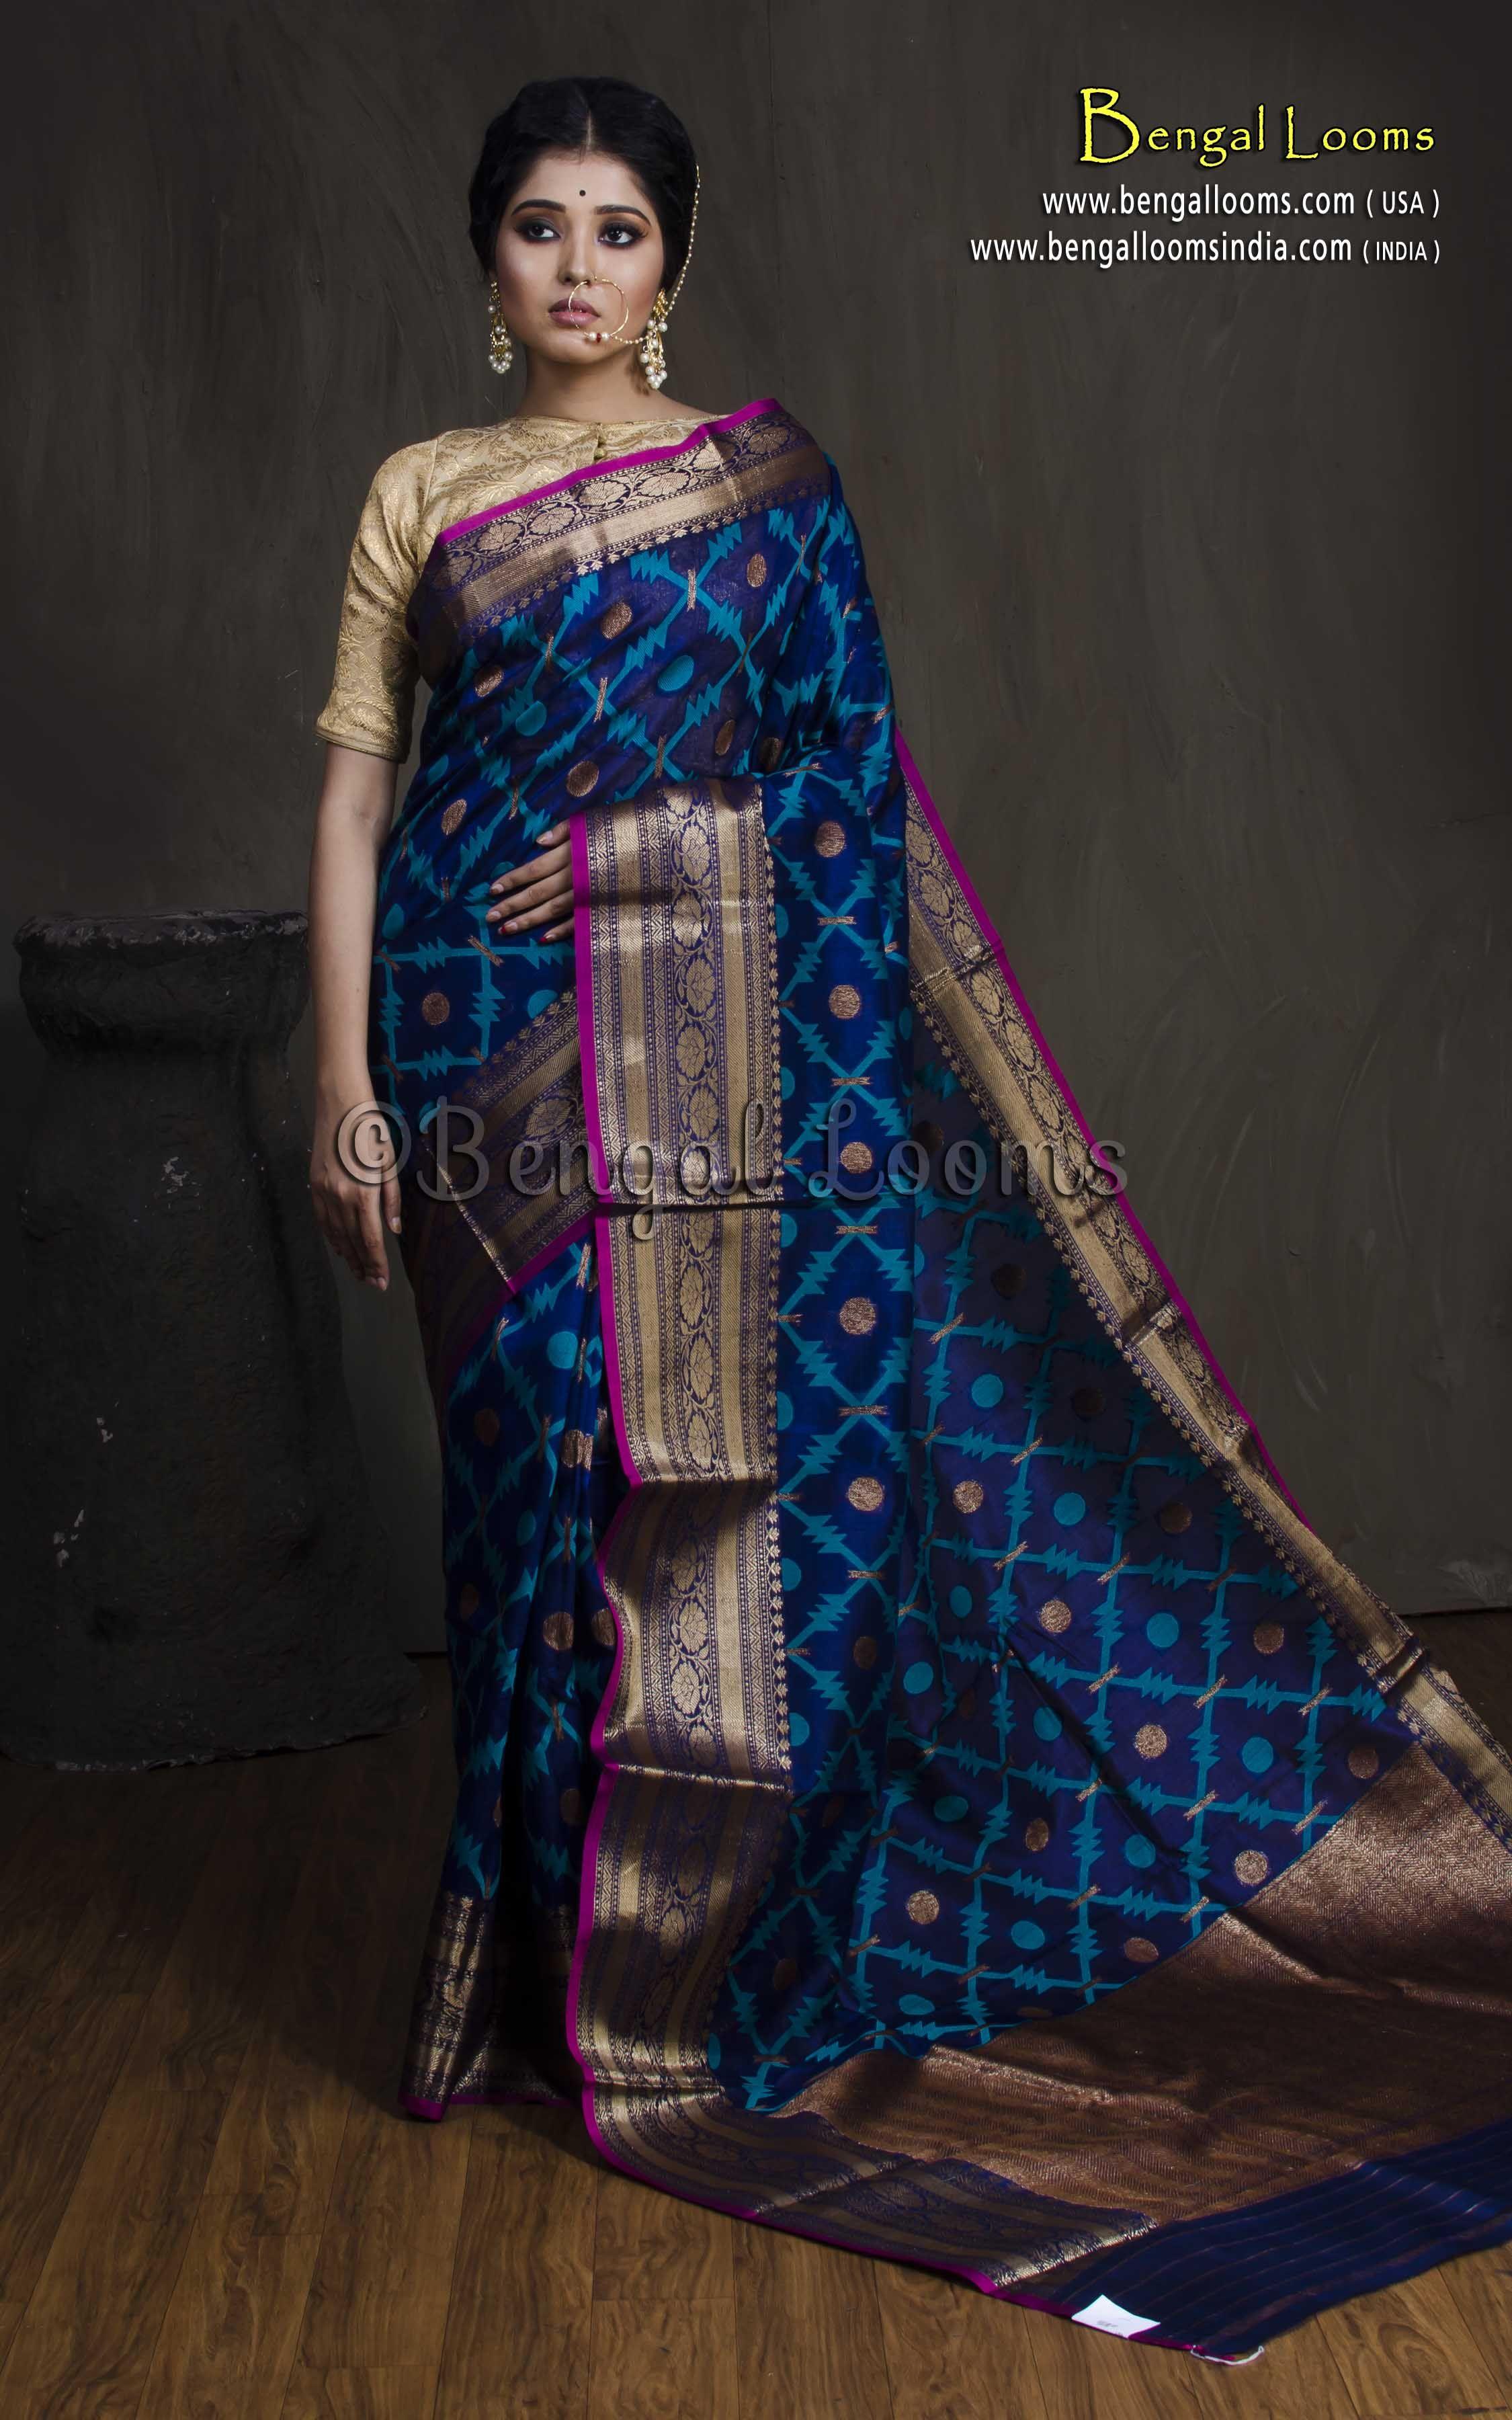 8dfb4b15f105d Jaal Work Tussar Banarasi Saree in Royal Blue and Antique Gold ...